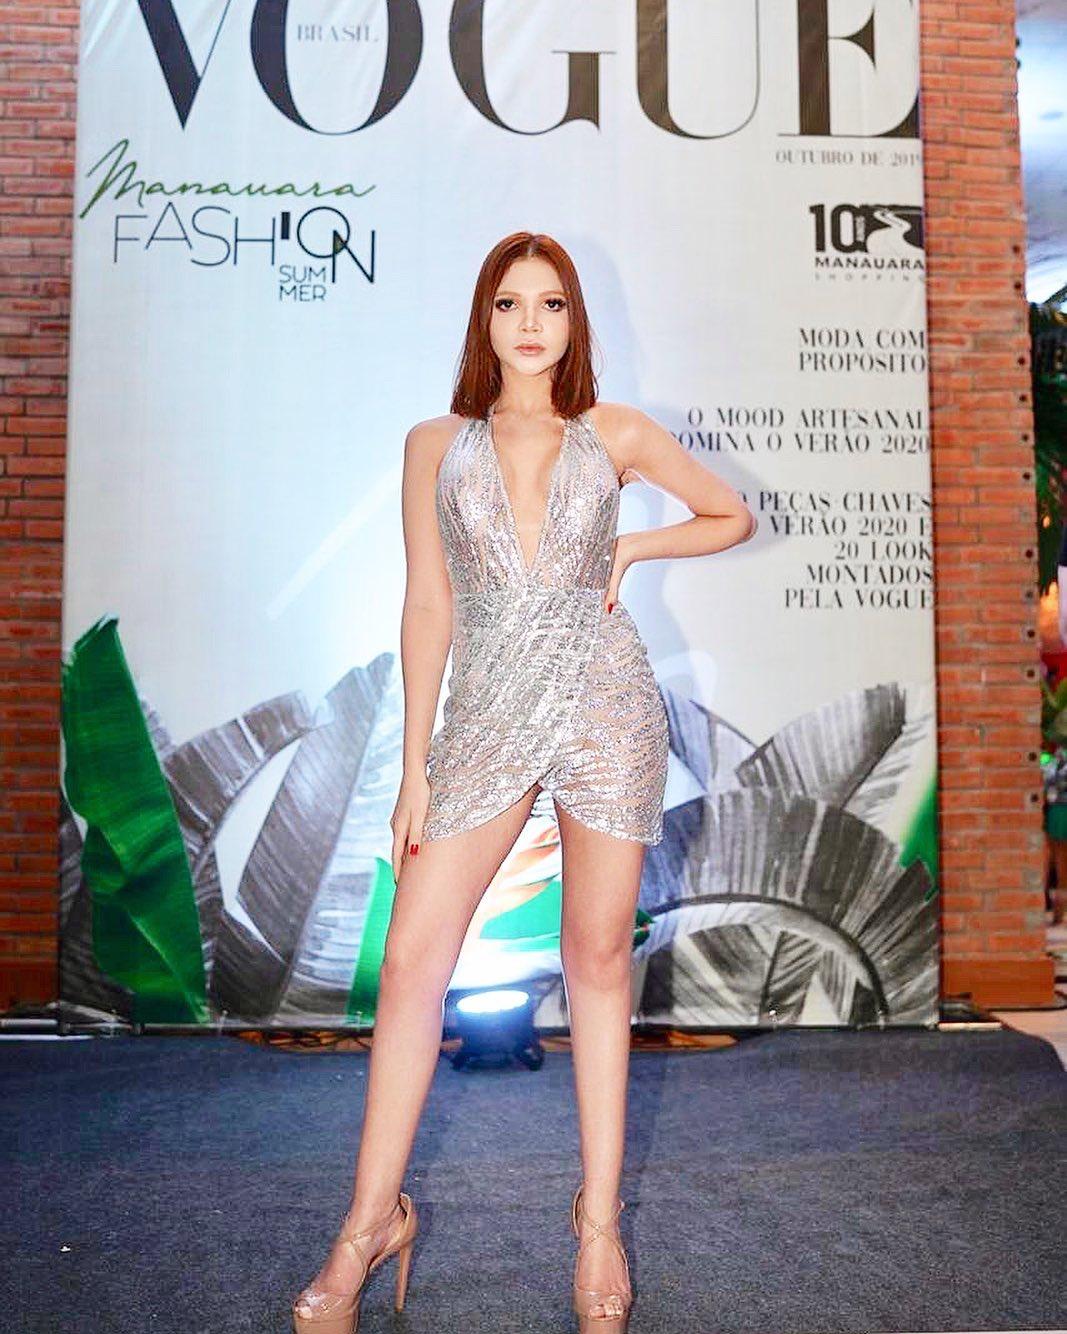 nathaly felix, top 20 de miss brasil mundo 2019. - Página 2 72529411